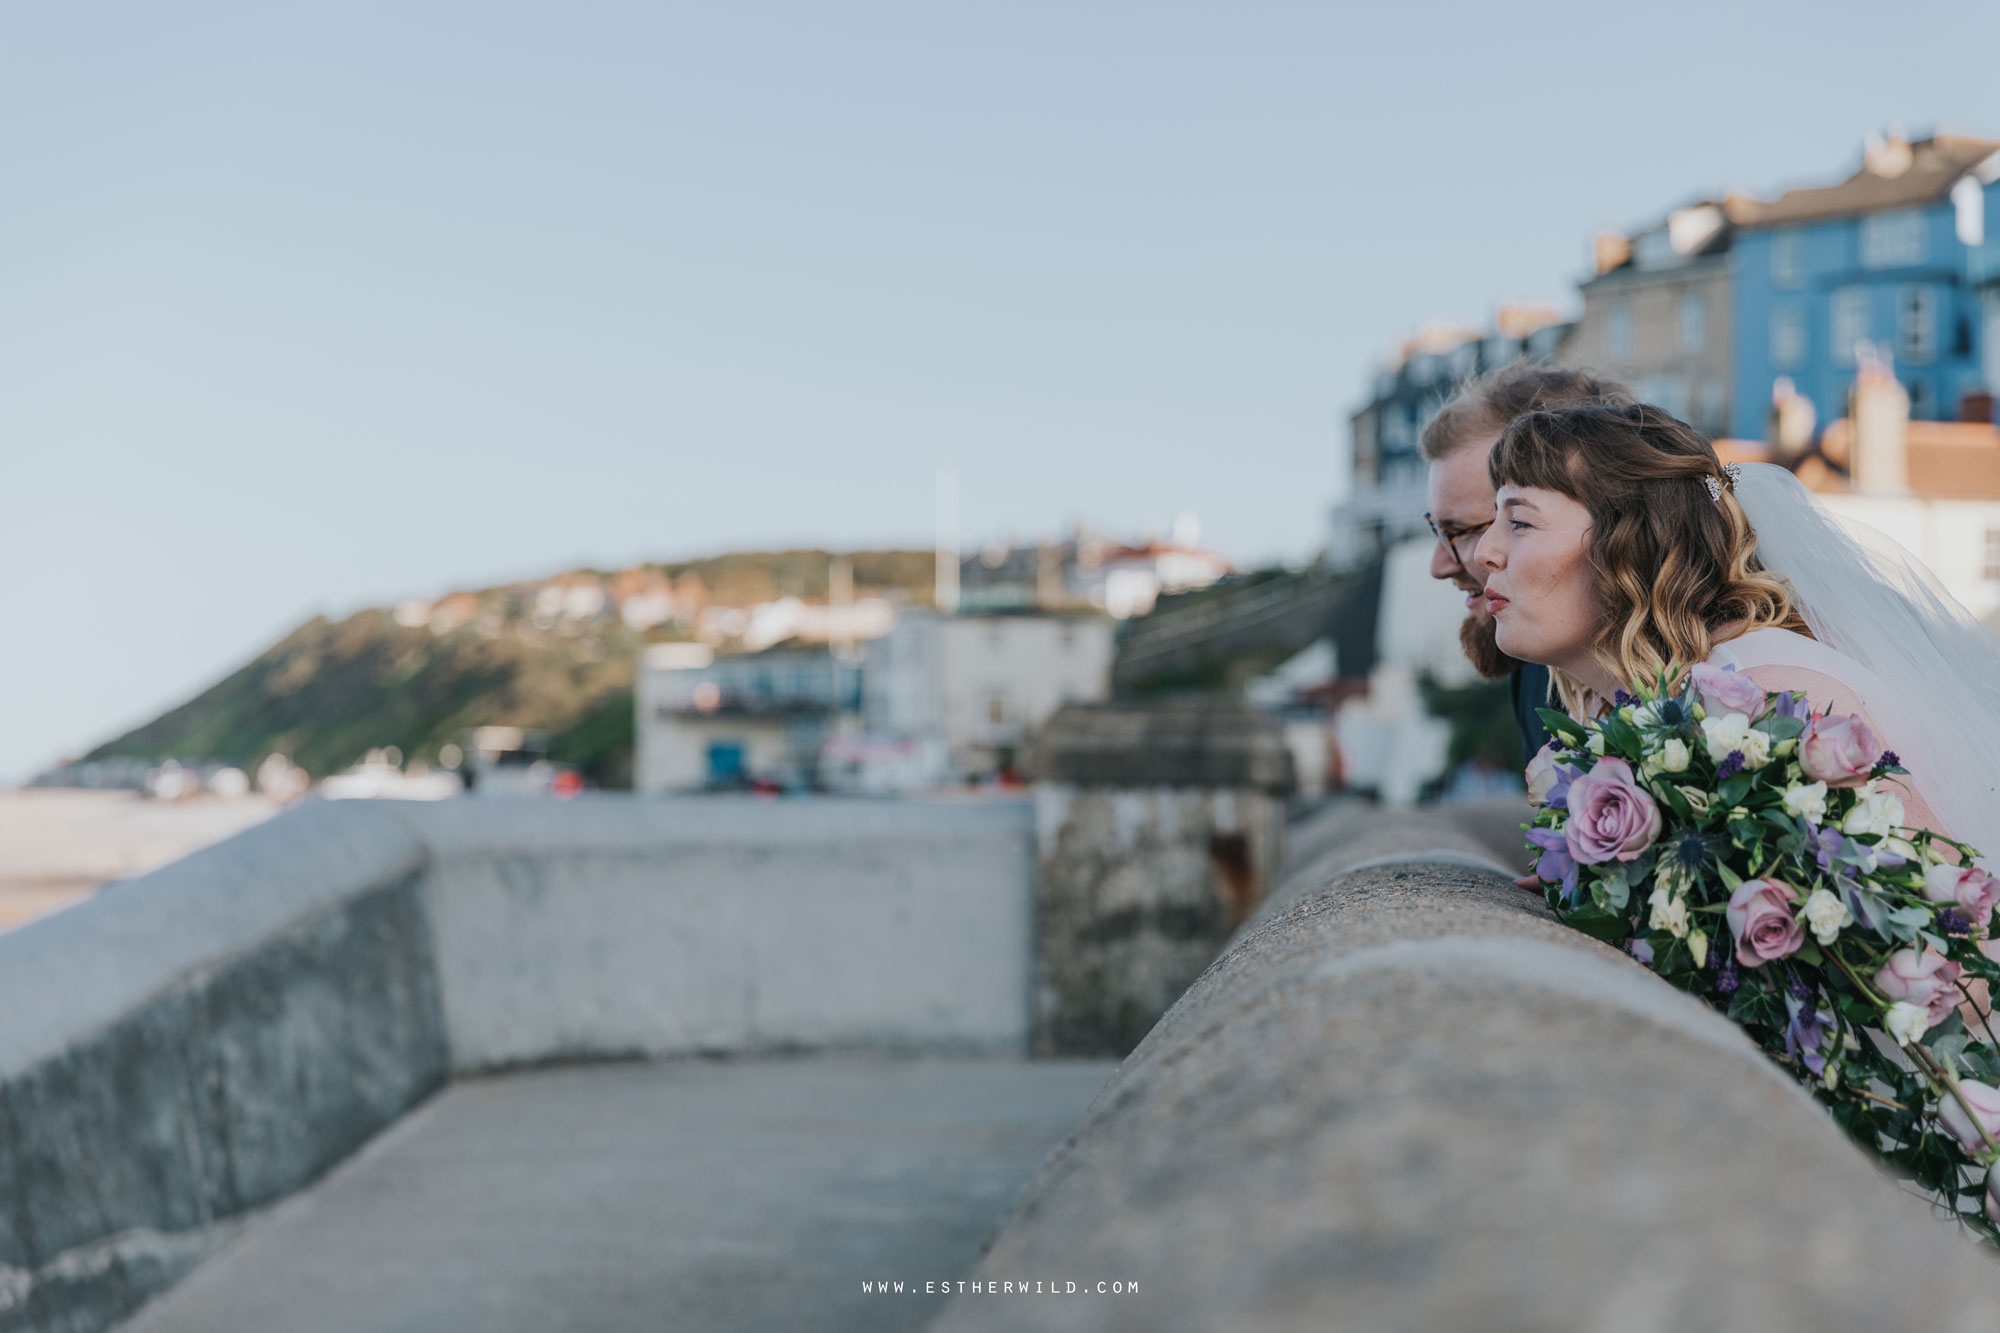 Cromer_Wedding_Beach_Outdoor_Ceremony_Norfolk_North_Lodge_Registry_Office_Rocket_House_Cafe_Cromer_Pier_IMG_4704.jpg